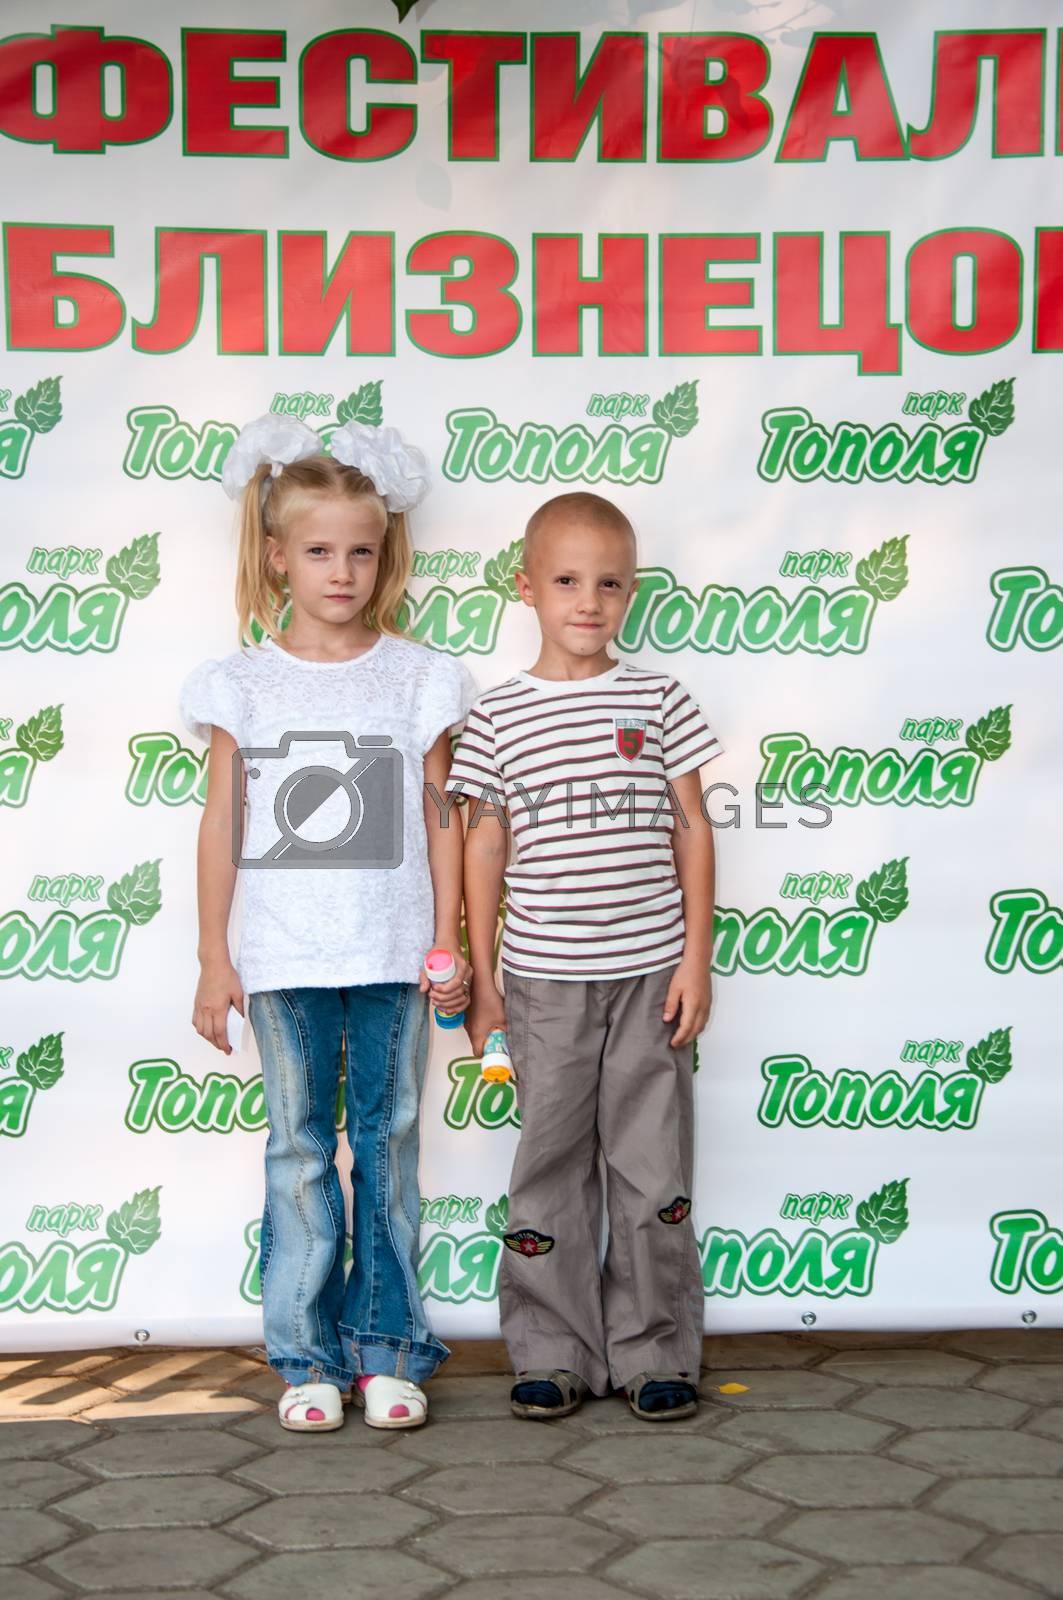 The city of Orenburg, Orenburg oblast, Russia, August 11, 2013. Festival of twins in the City Park of Poplar. http://park-topolya.ru/